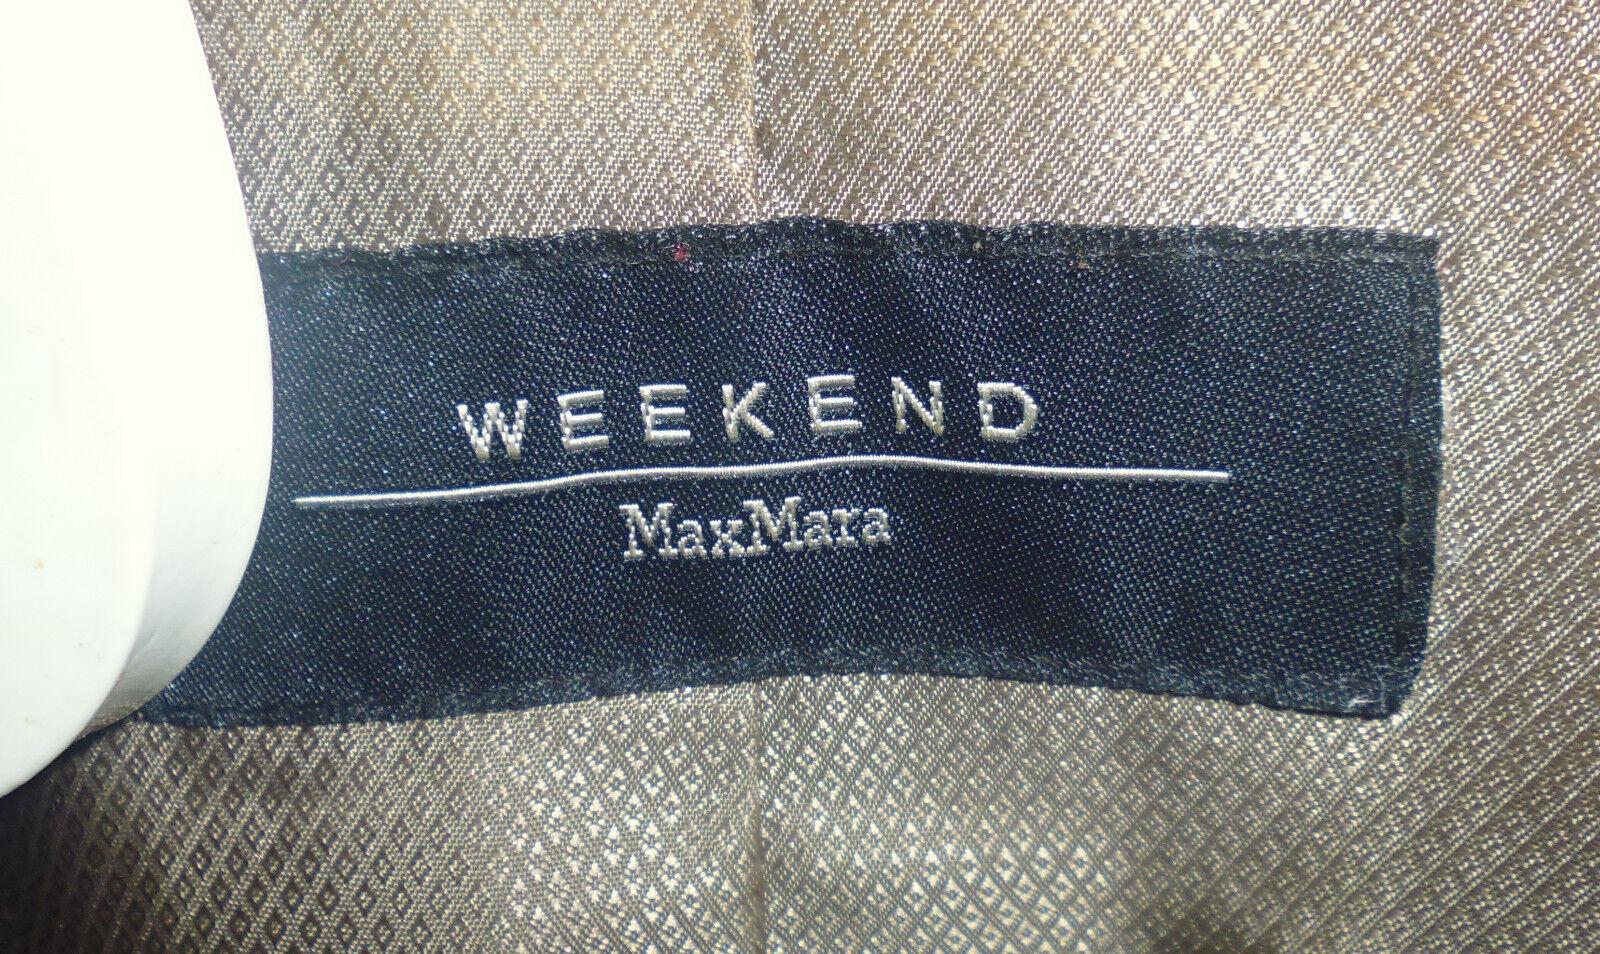 Manteau Manteau Manteau Max Mara Weekend - size 36 c760b5